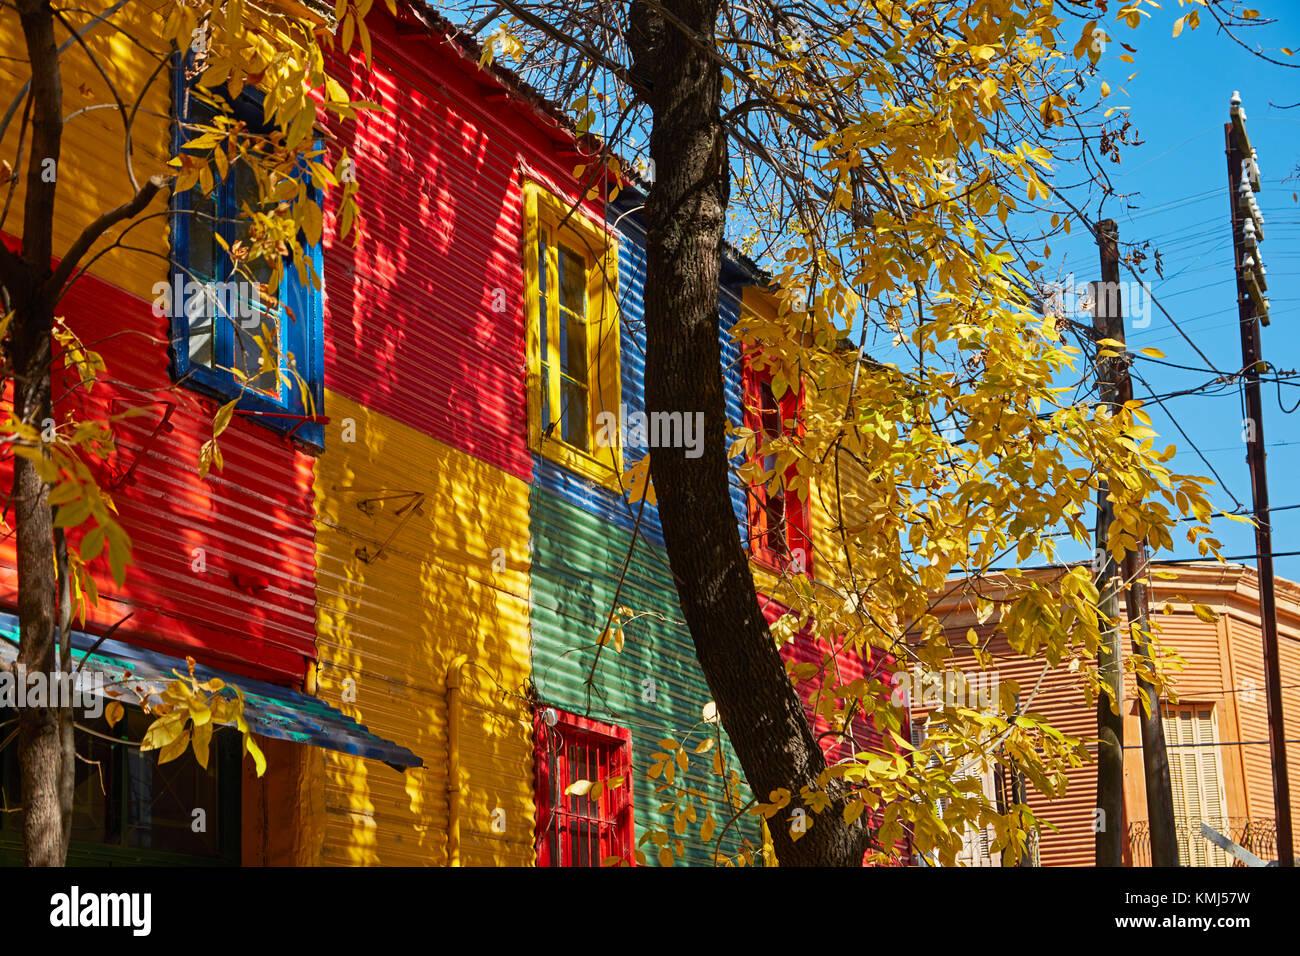 Colourful corrugated iron buildings, La Boca, Buenos Aires, Argentina, South America - Stock Image